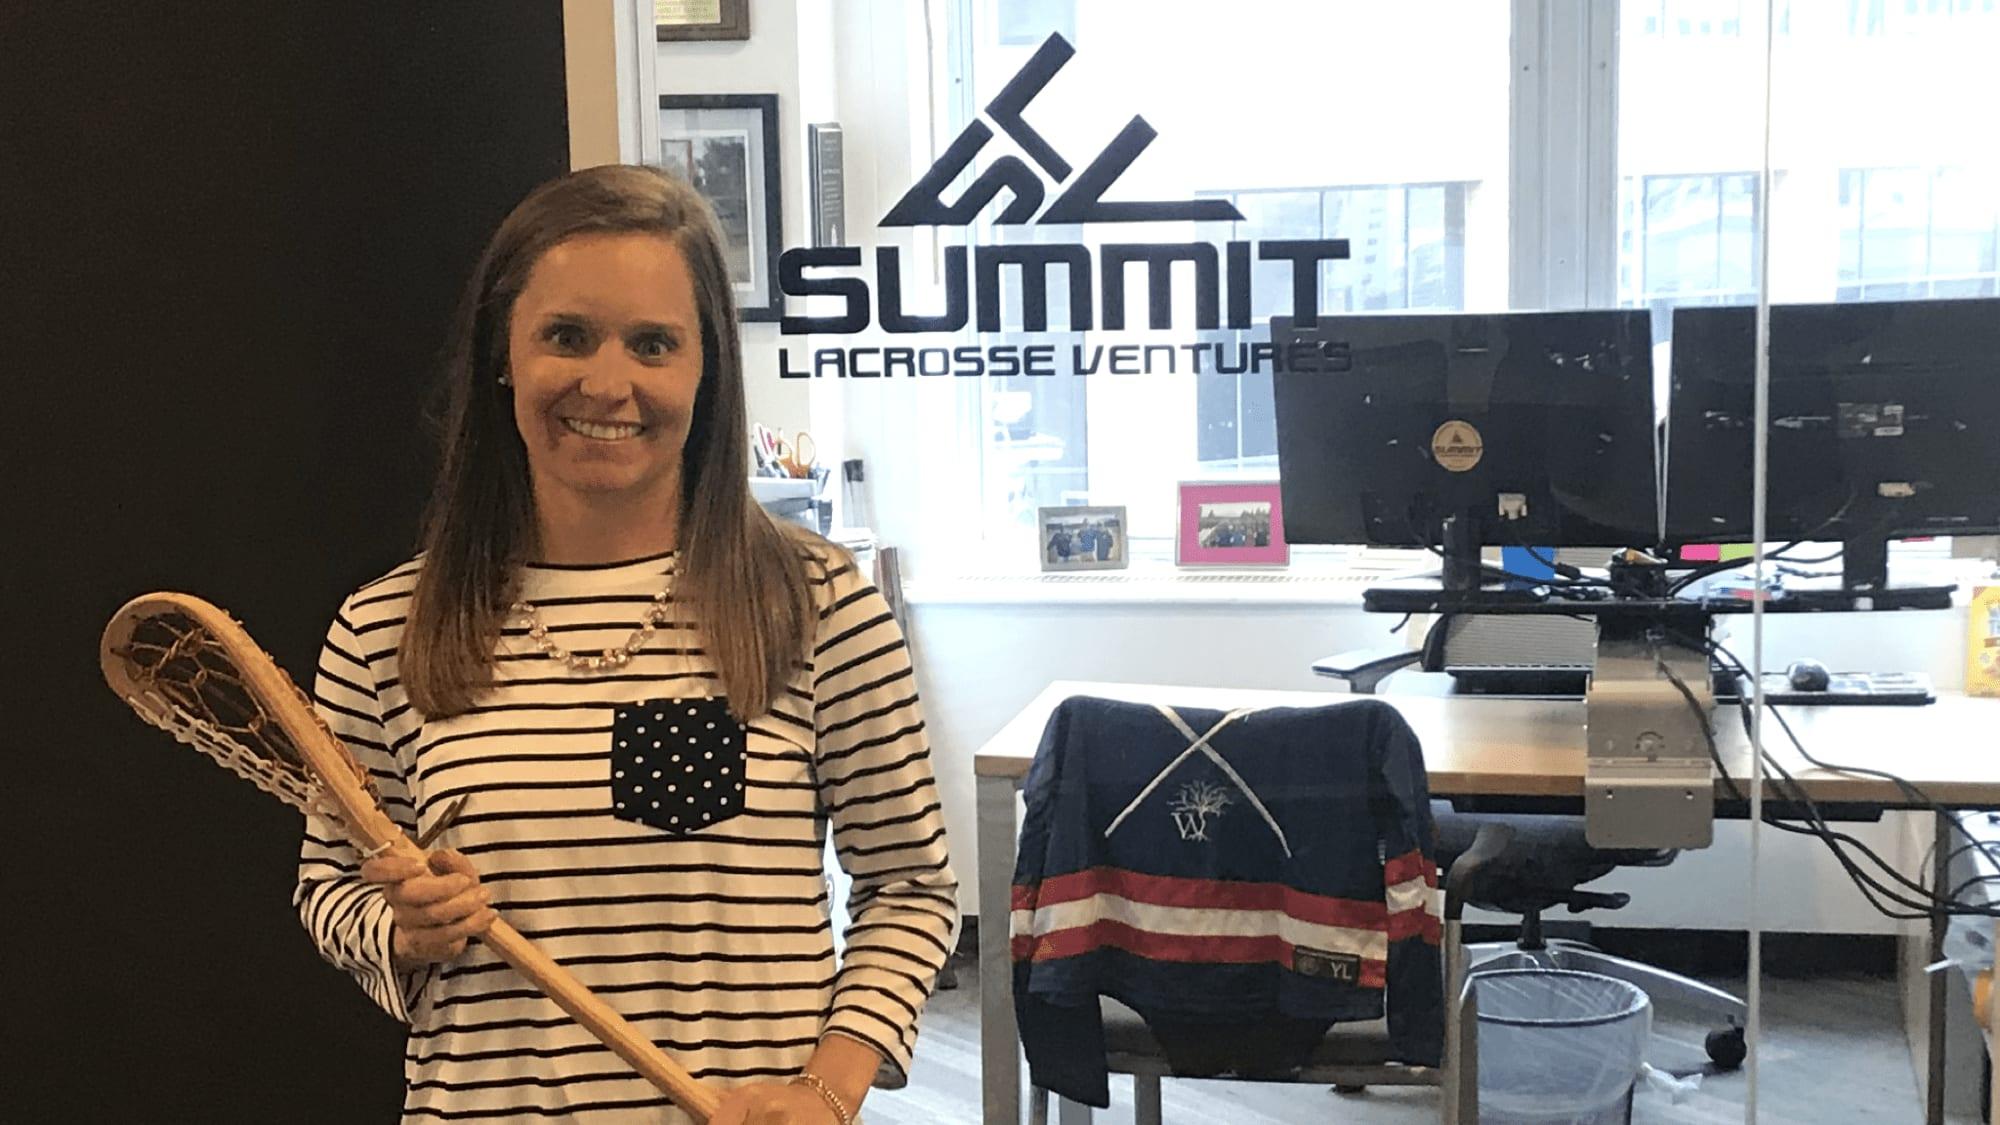 ashley gersuk murphy outside the eight women's lacrosse podcast outside the 8